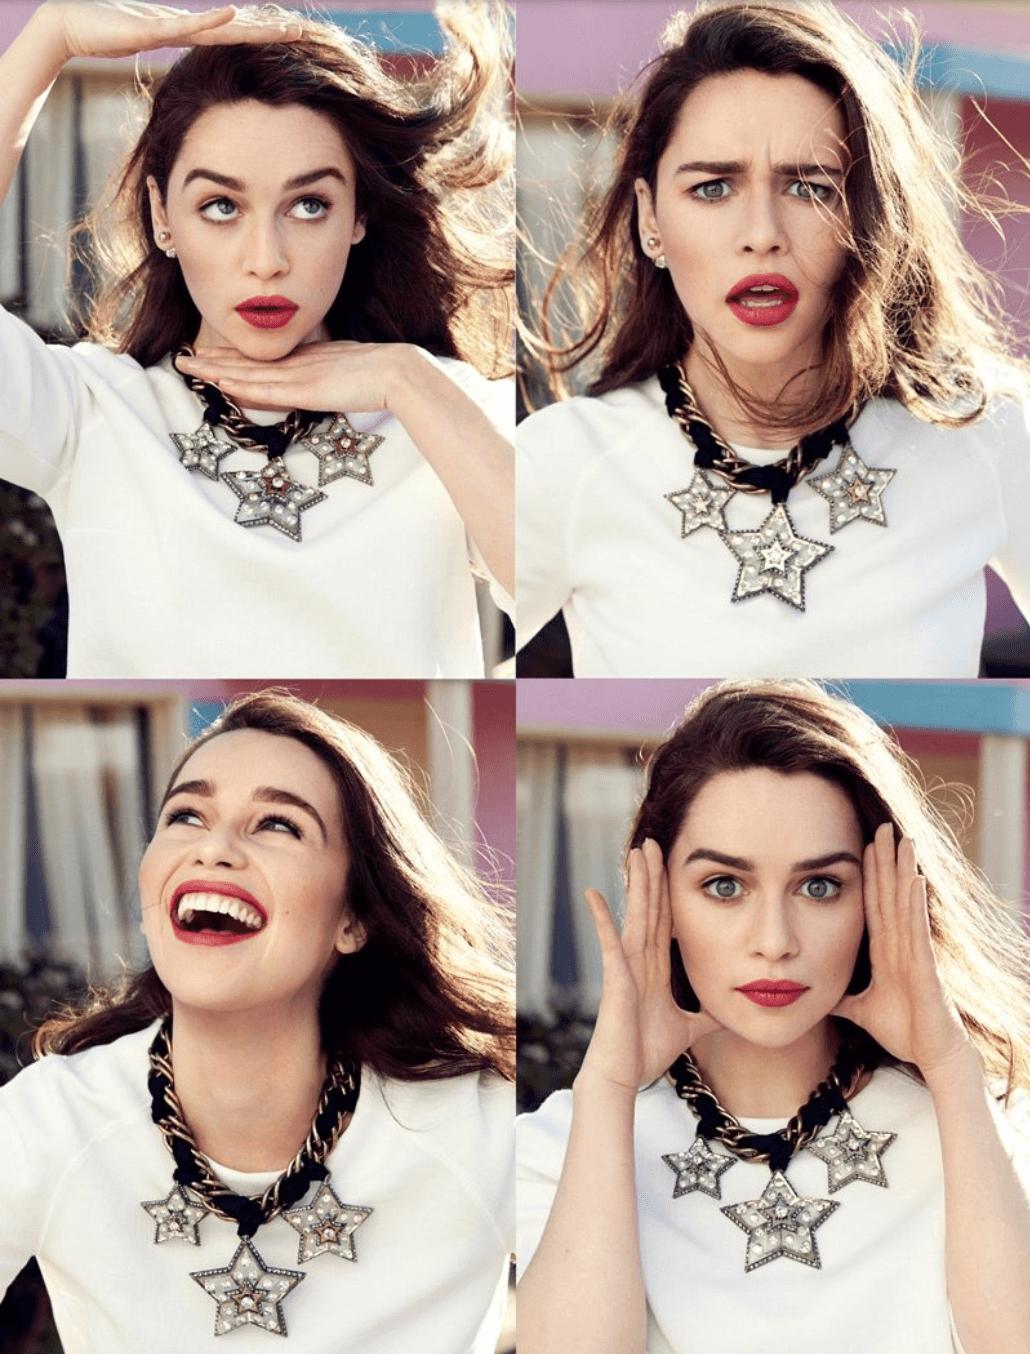 Emilia Clarke photos mode  Cliquez pour Agrandir Emilia Clarke Boyfriend 2014